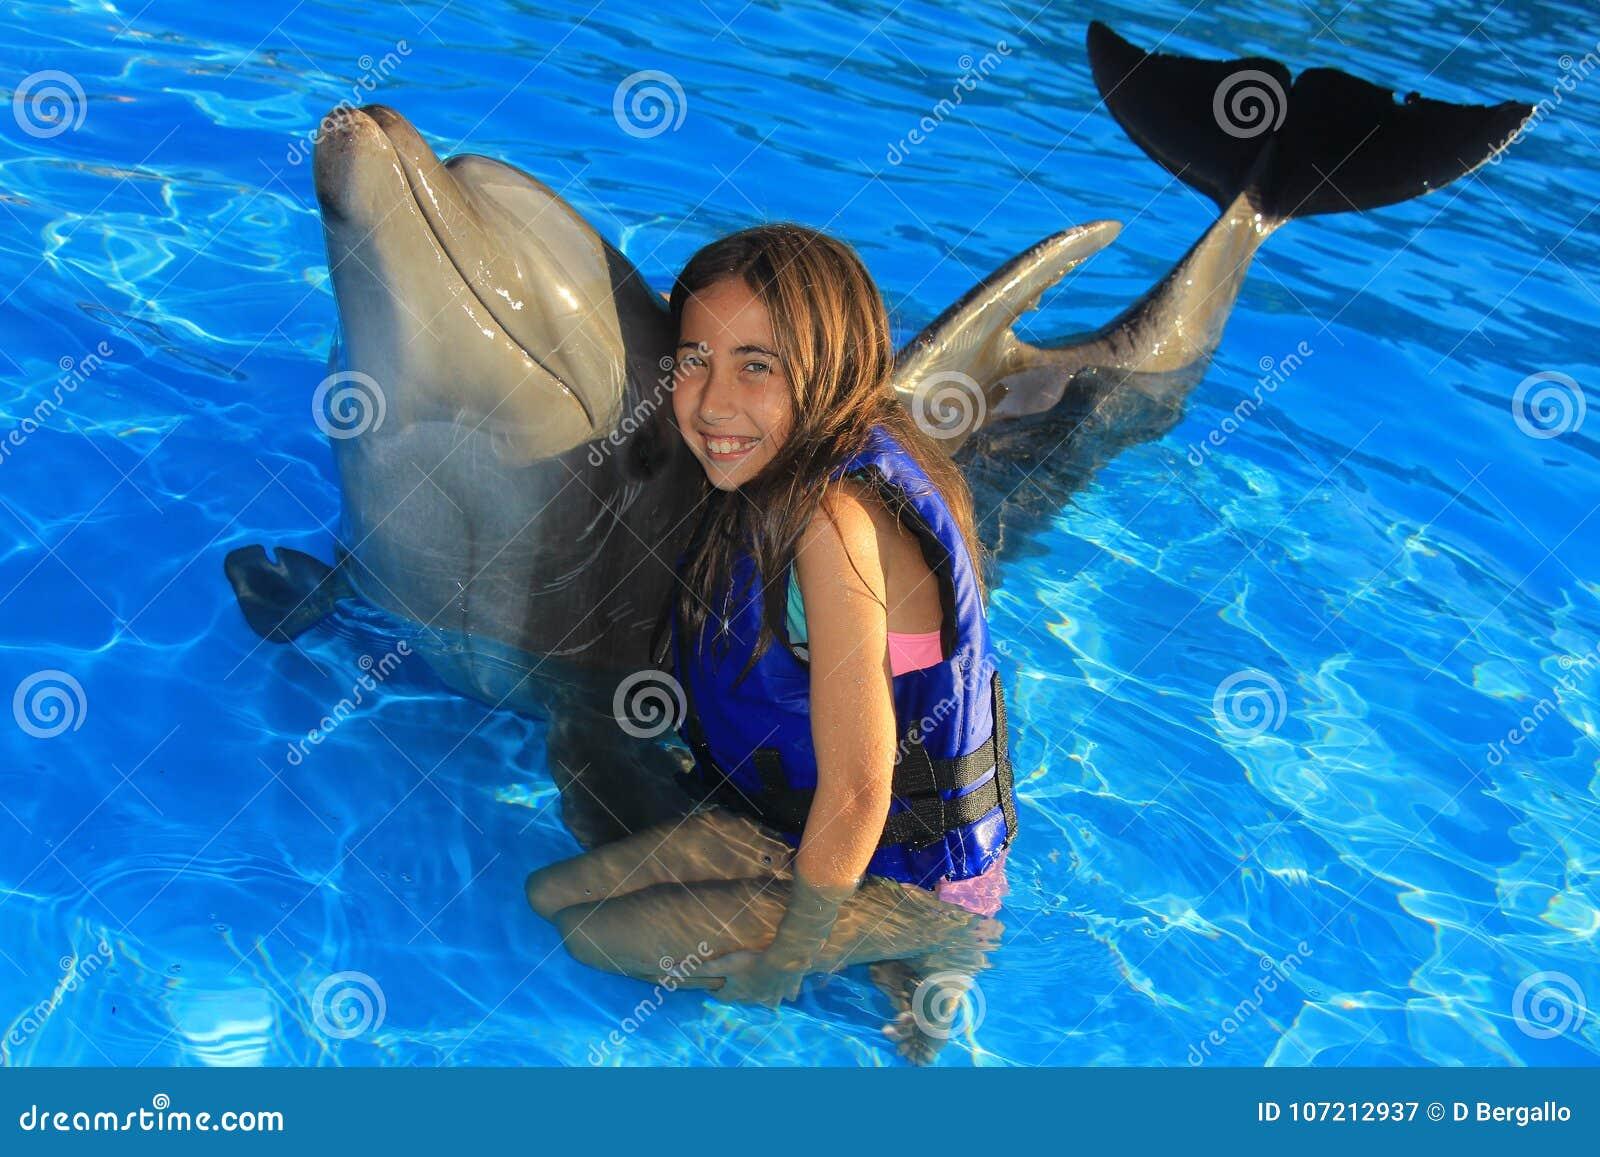 Little girl children hugging a gorgeous dolphin flipper smiling face happy kid swim bottle nose dolphins